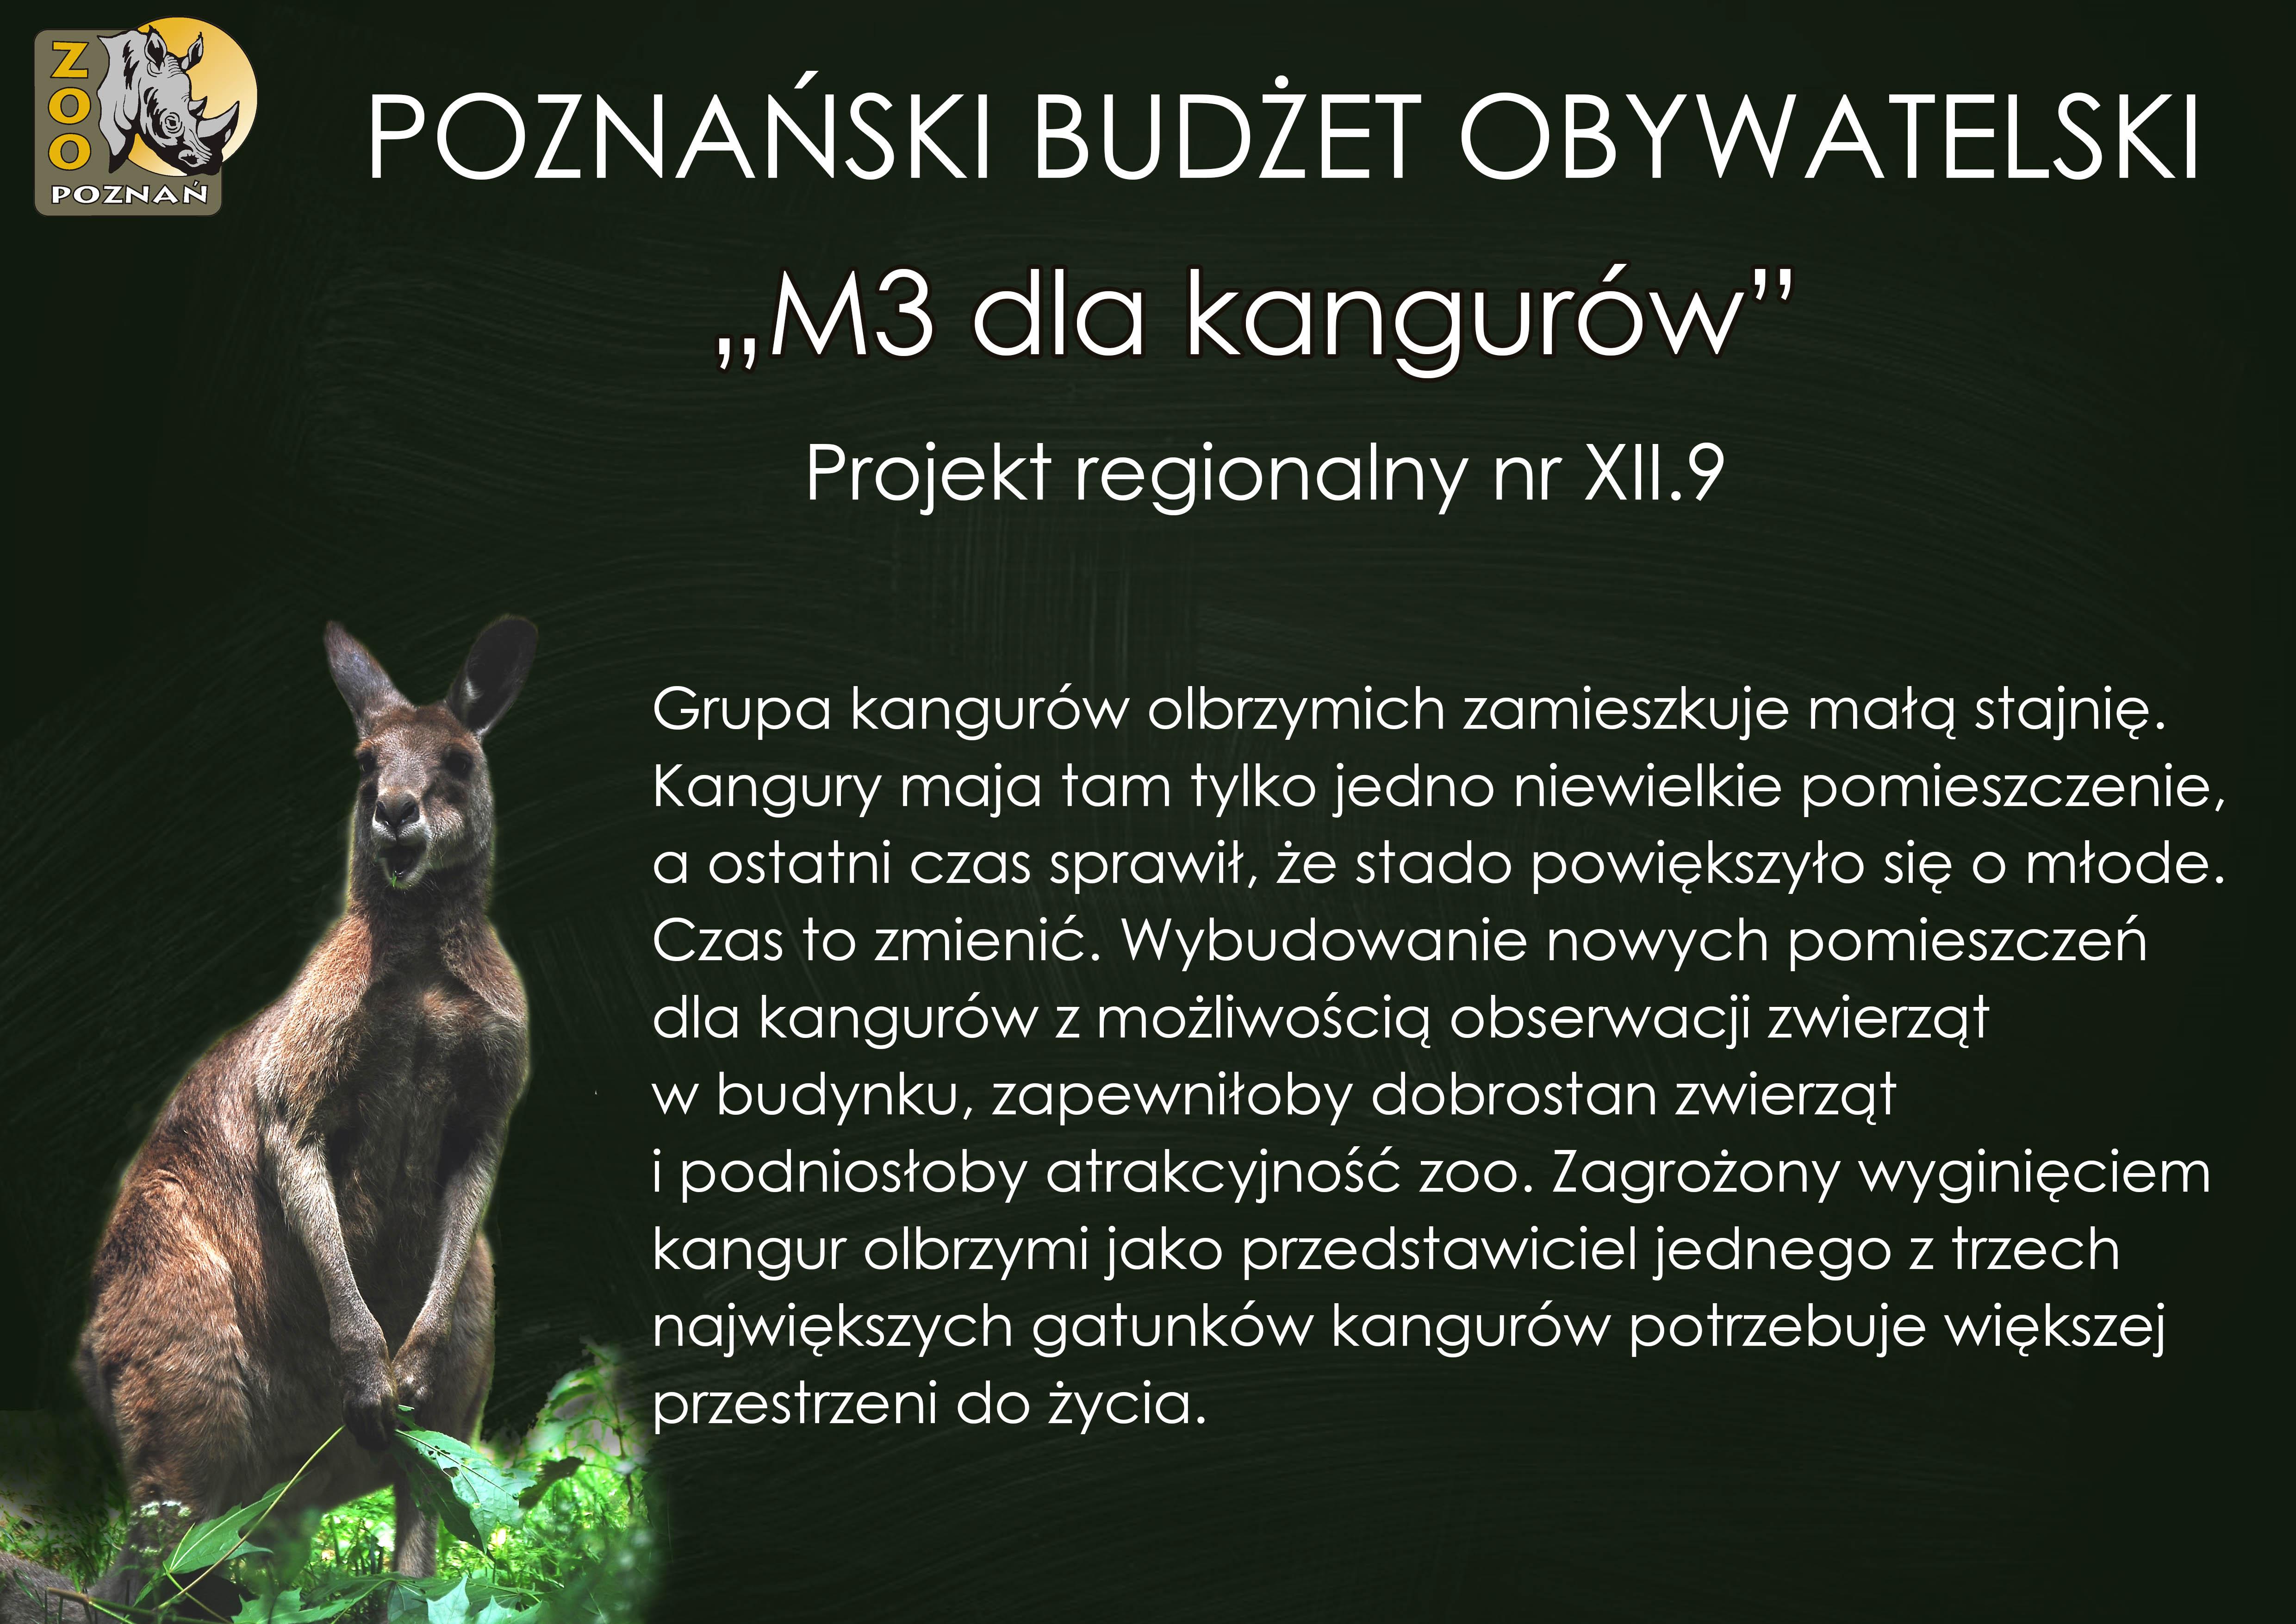 PBO_M3-dla-kangurow15578